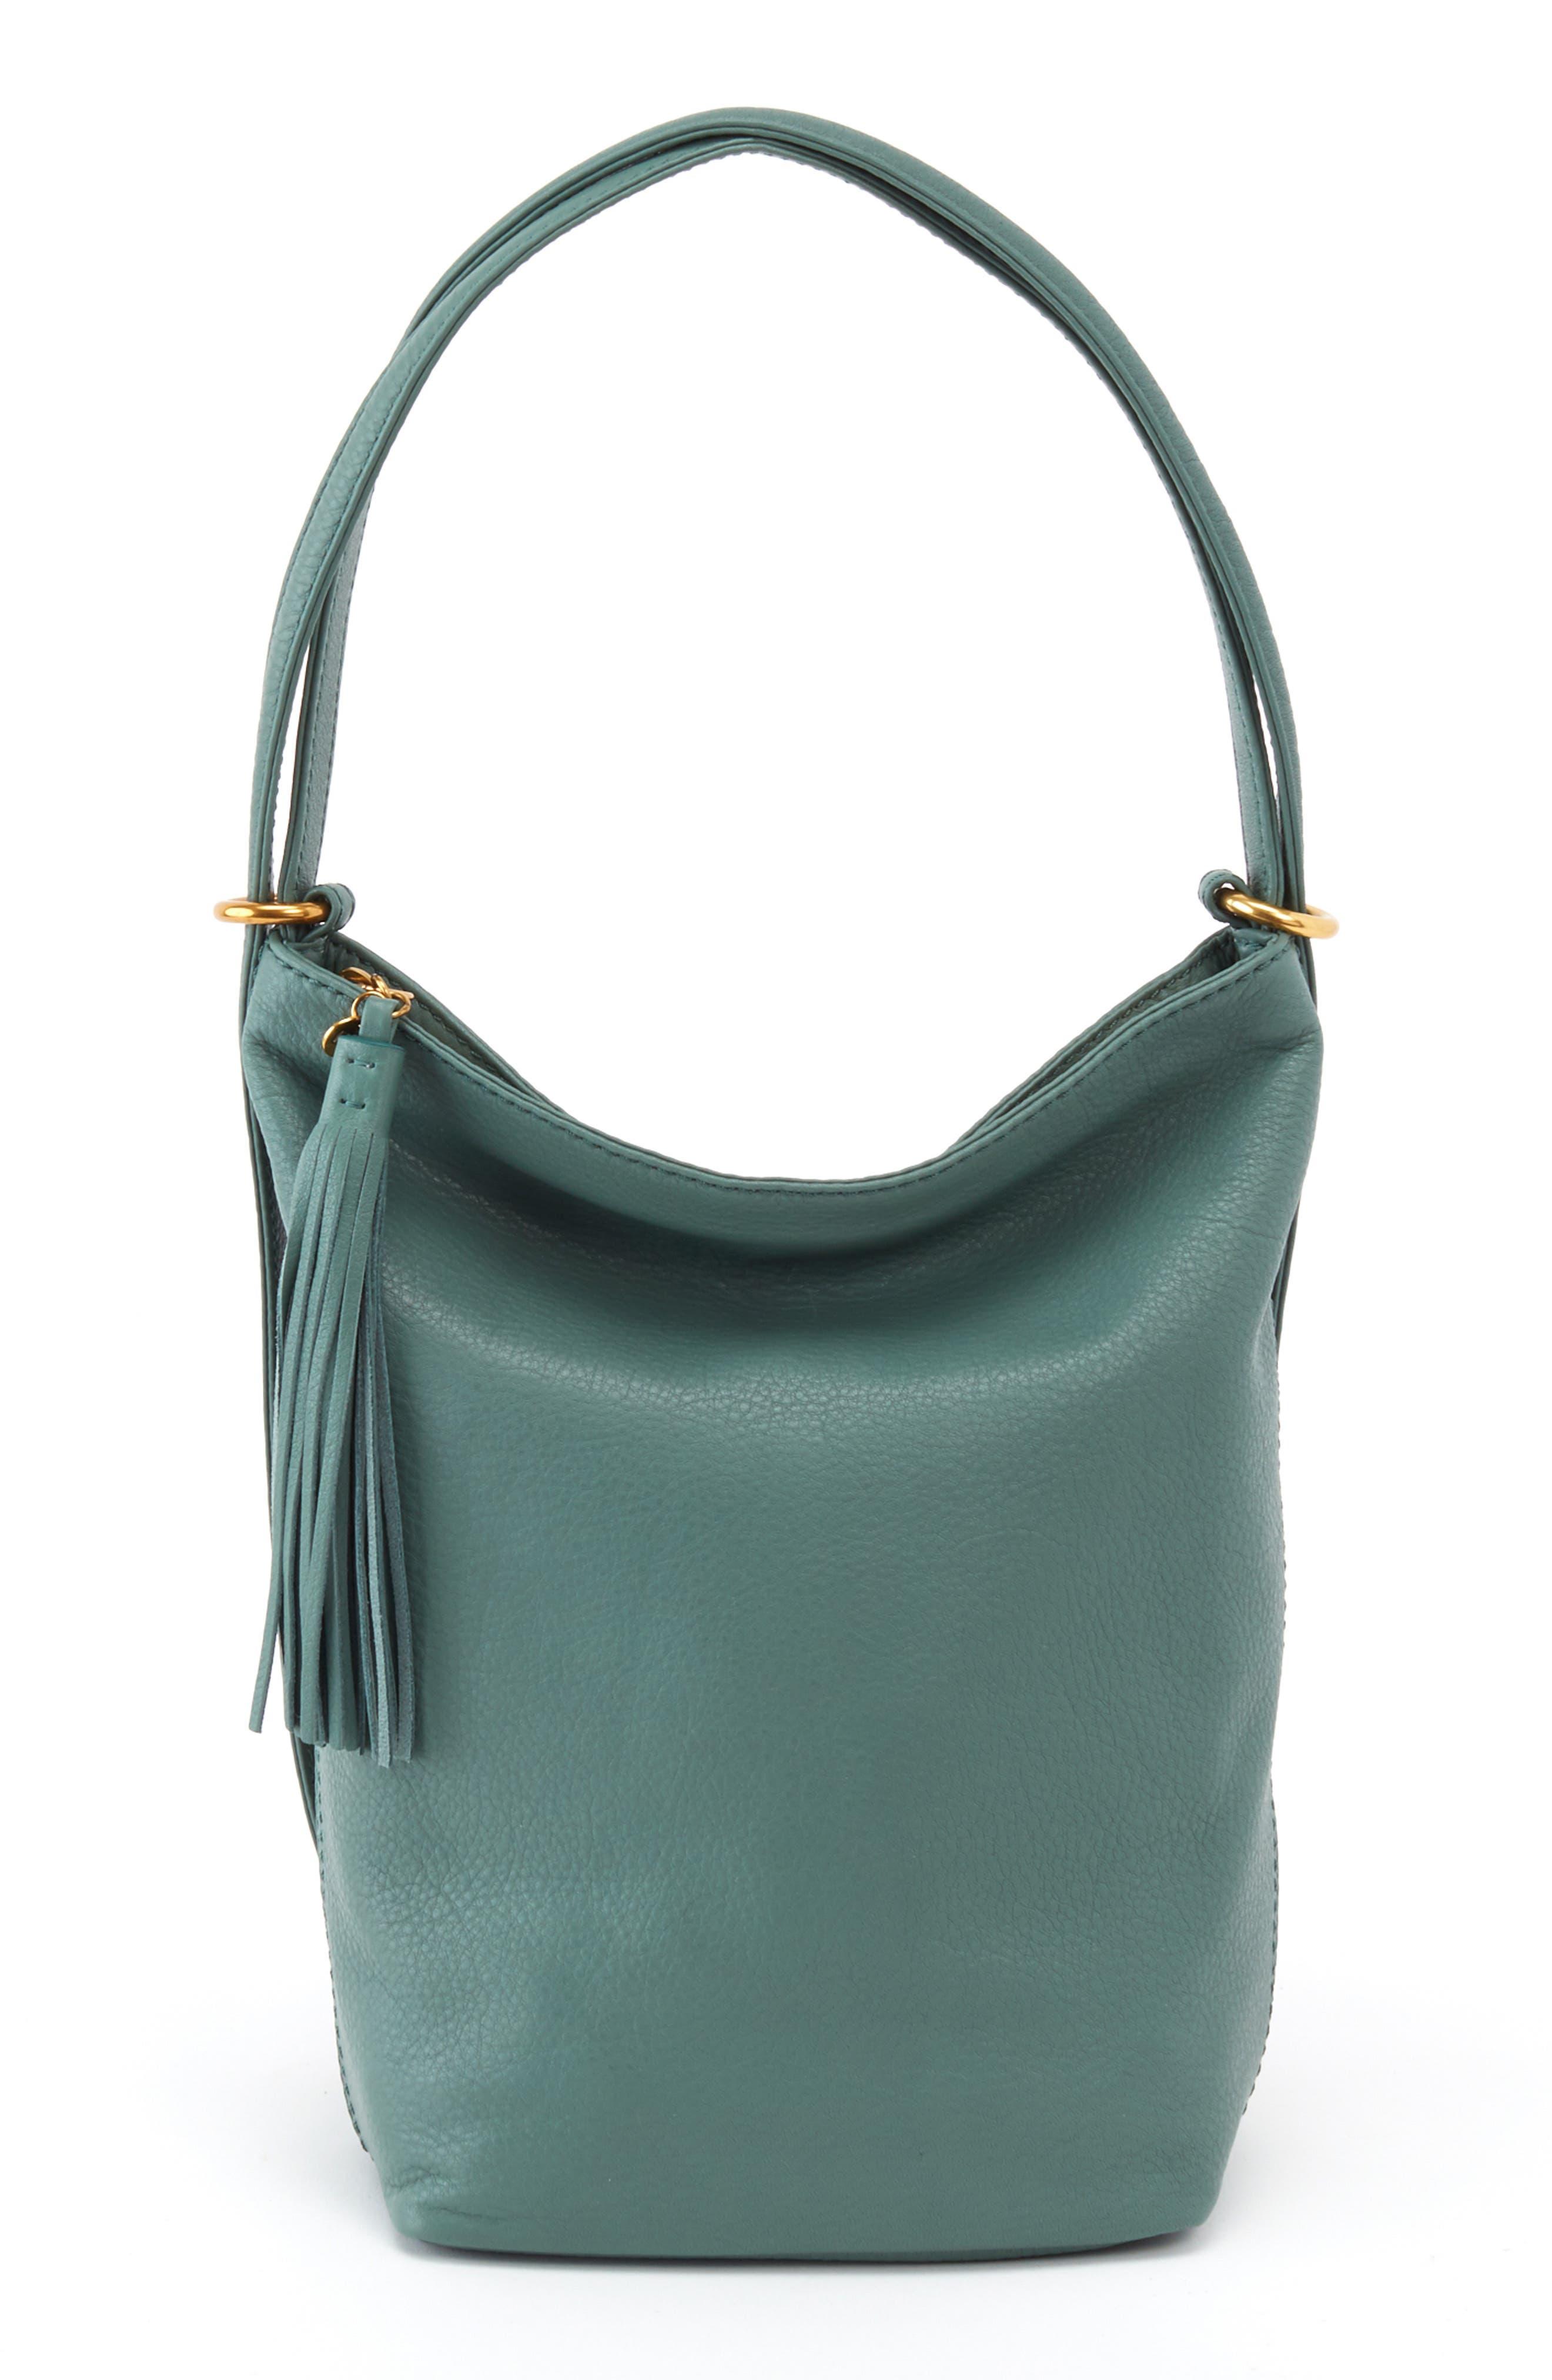 Off-White Shoulder Bags   Nordstrom 97a970c783